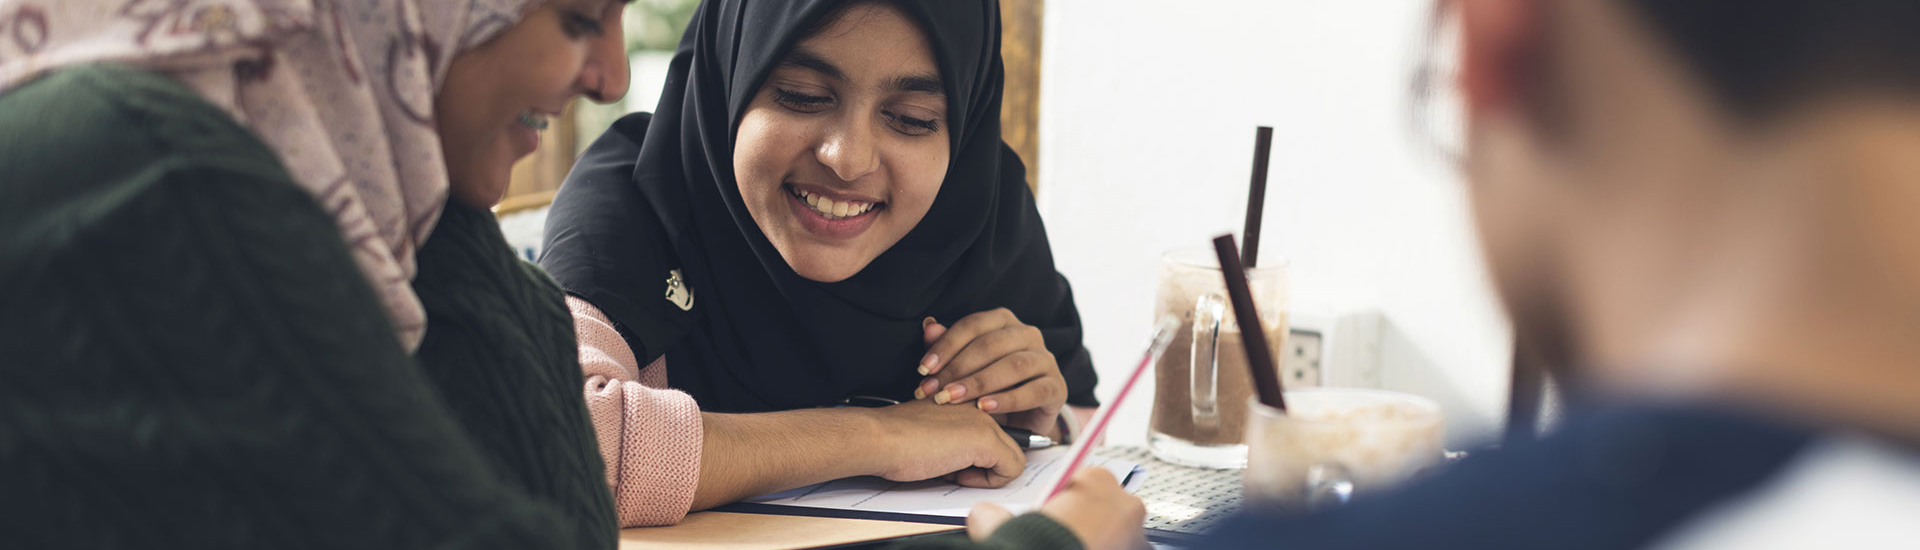 case studies edmentum international education